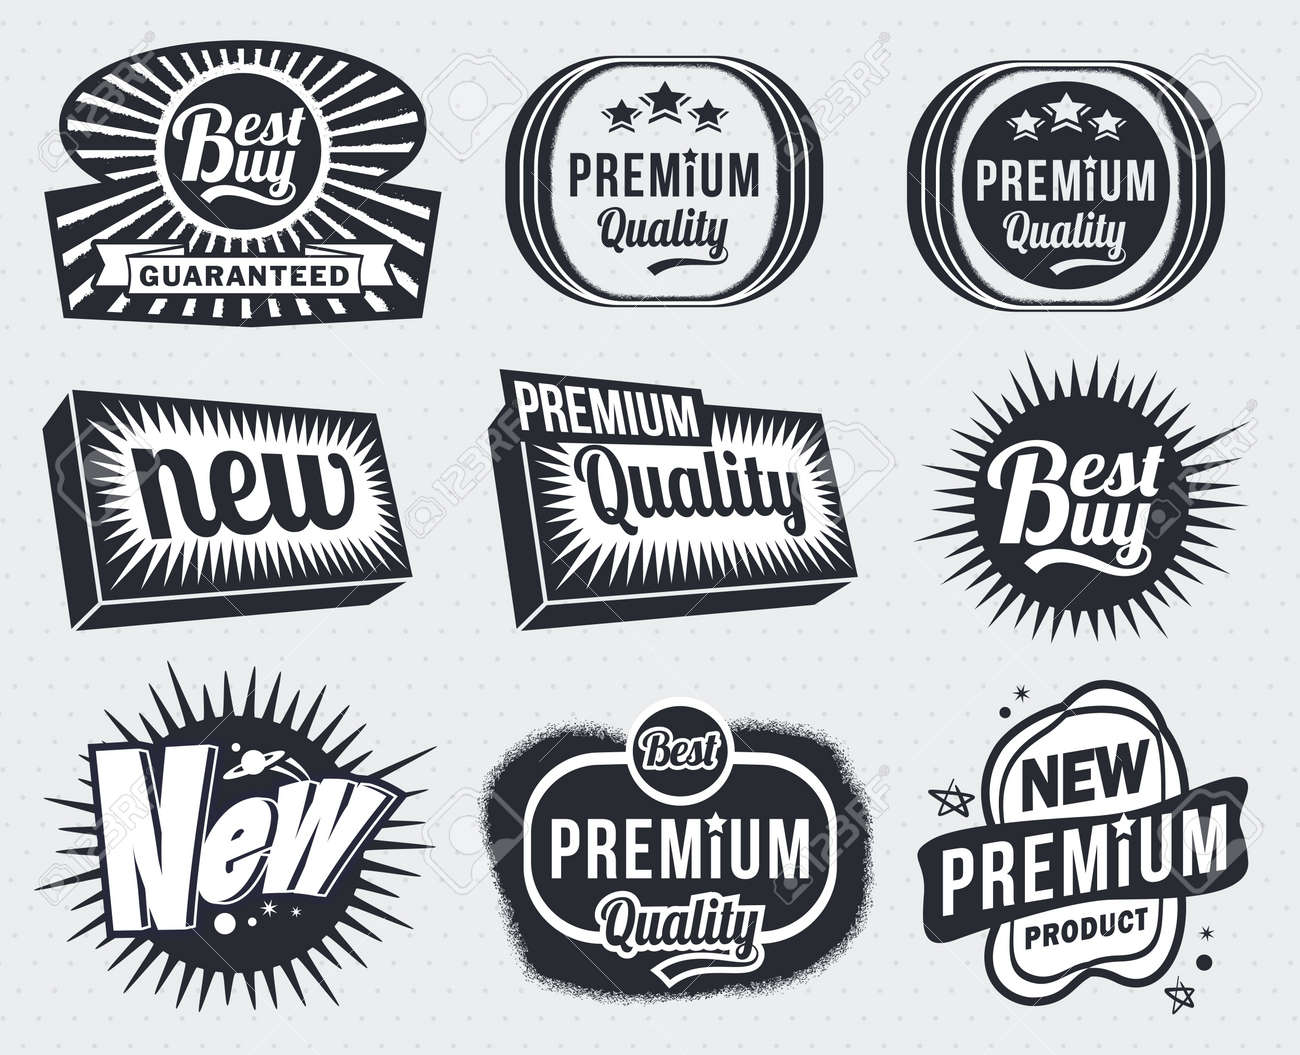 Illustration - Vintage Badge Labels Royalty Free Cliparts, Vectors ...